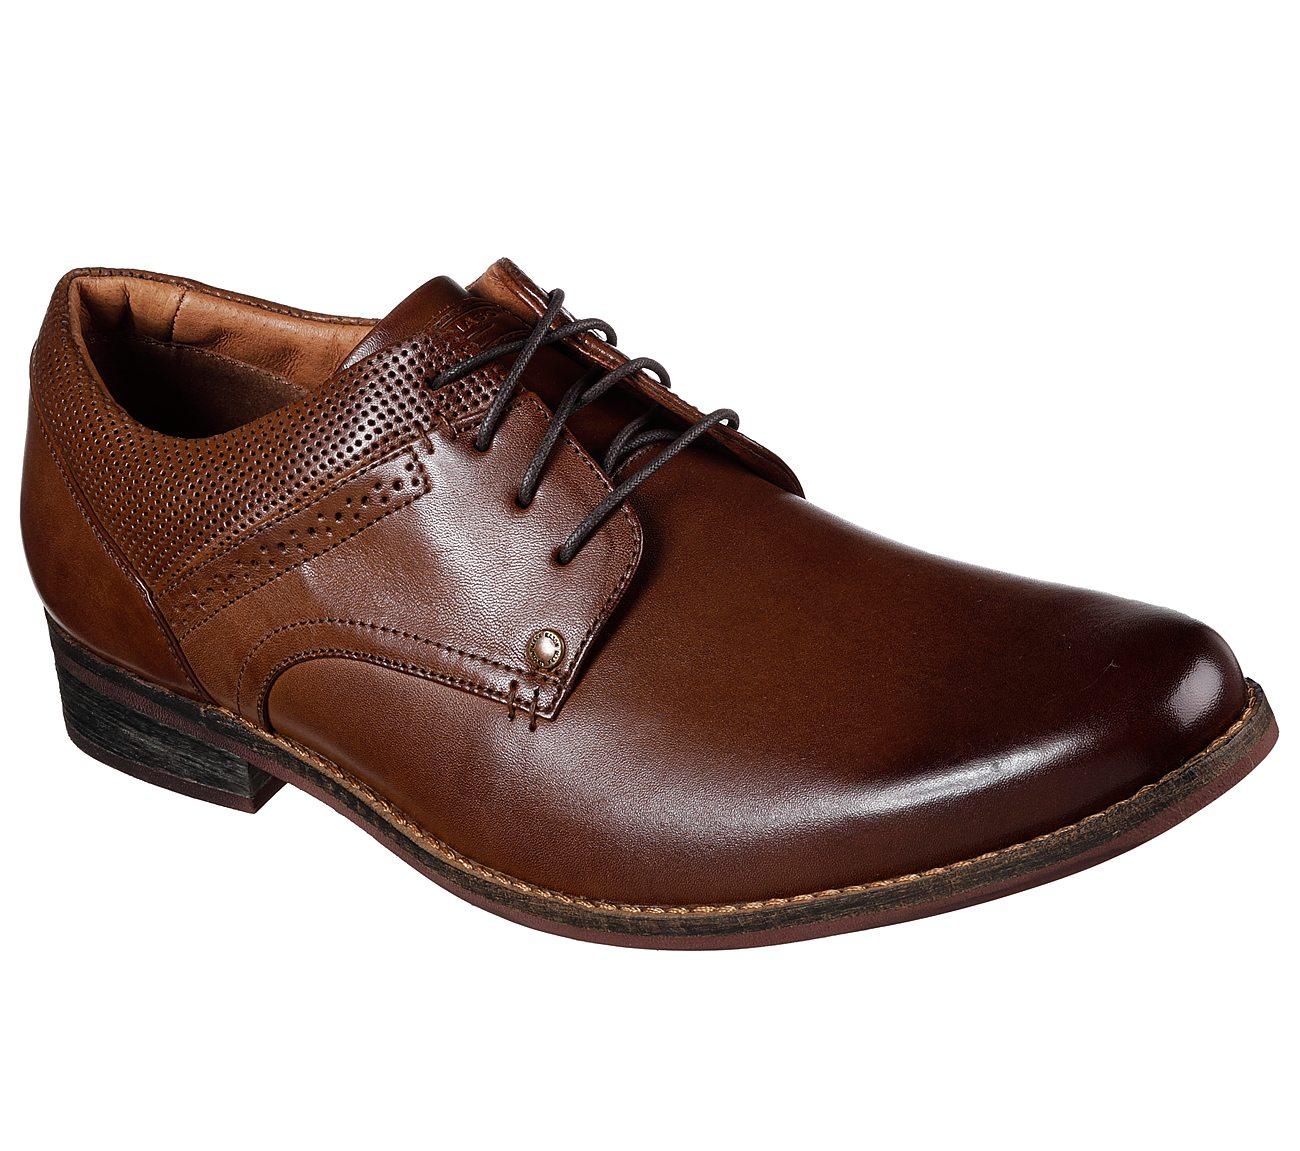 Buy SKECHERS Tatum Mark Nason Shoes